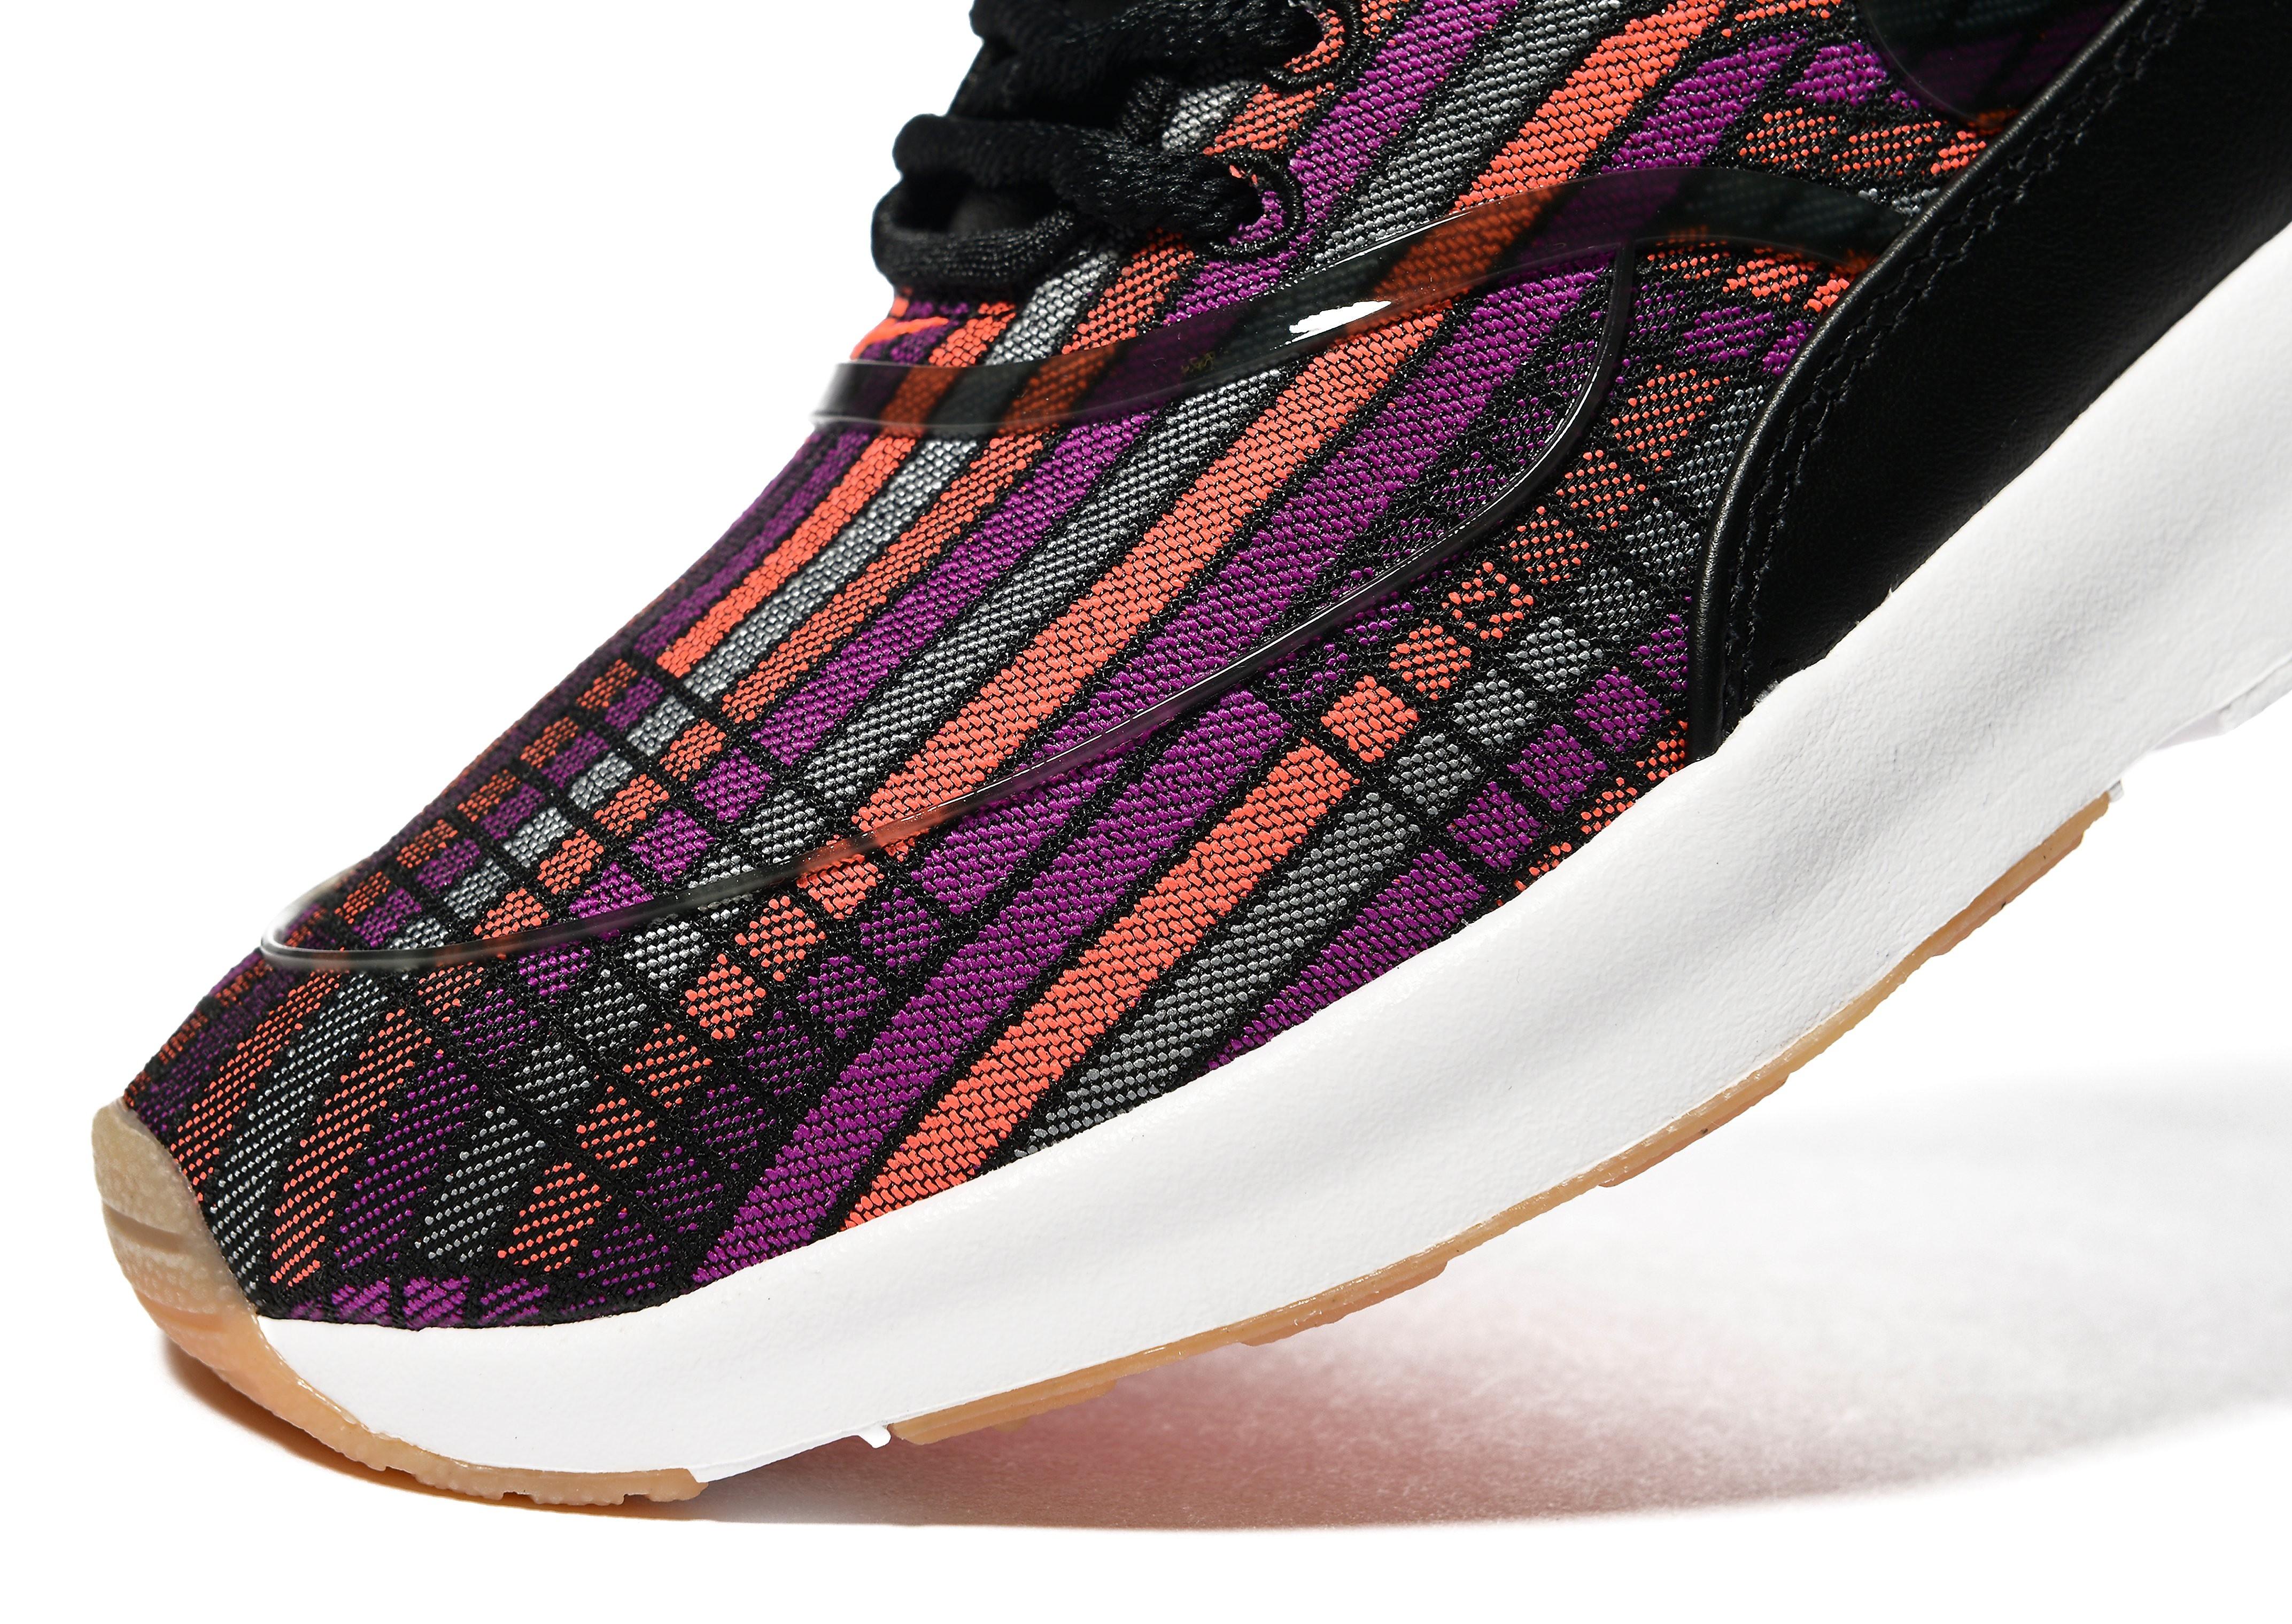 Nike Beautiful x Powerful Air Max Thea Jacquard Women's